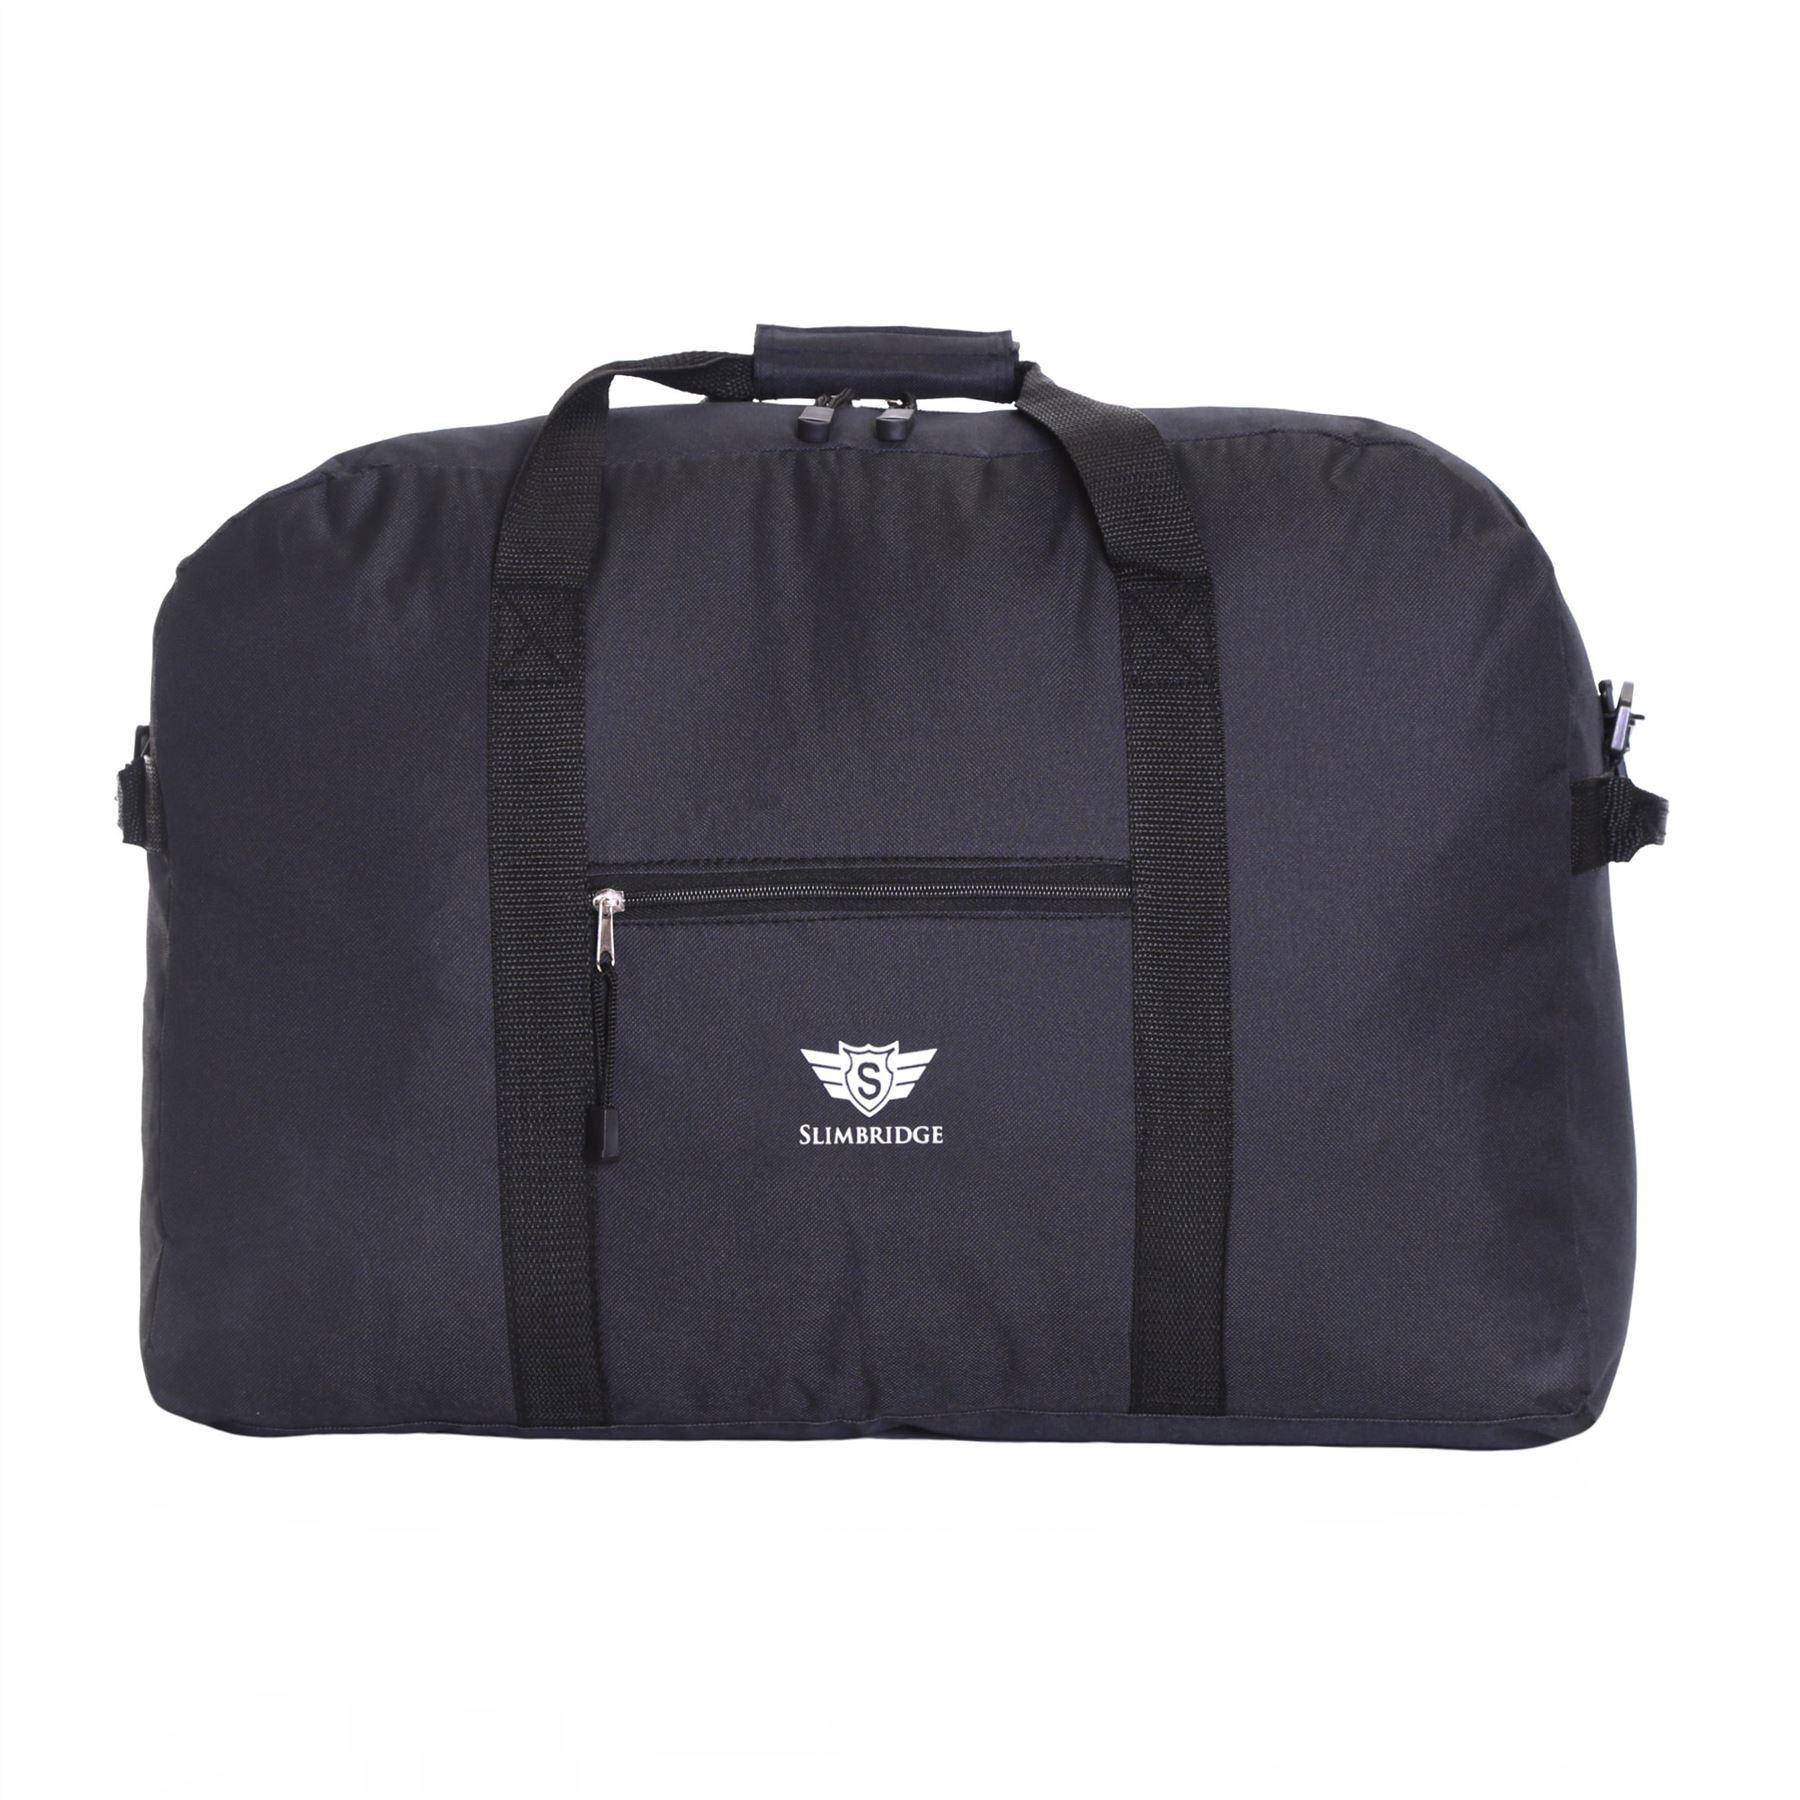 Ryanair Set Of 2 Cabin Hand Luggage Bags 55 X 40 X 20 Cm